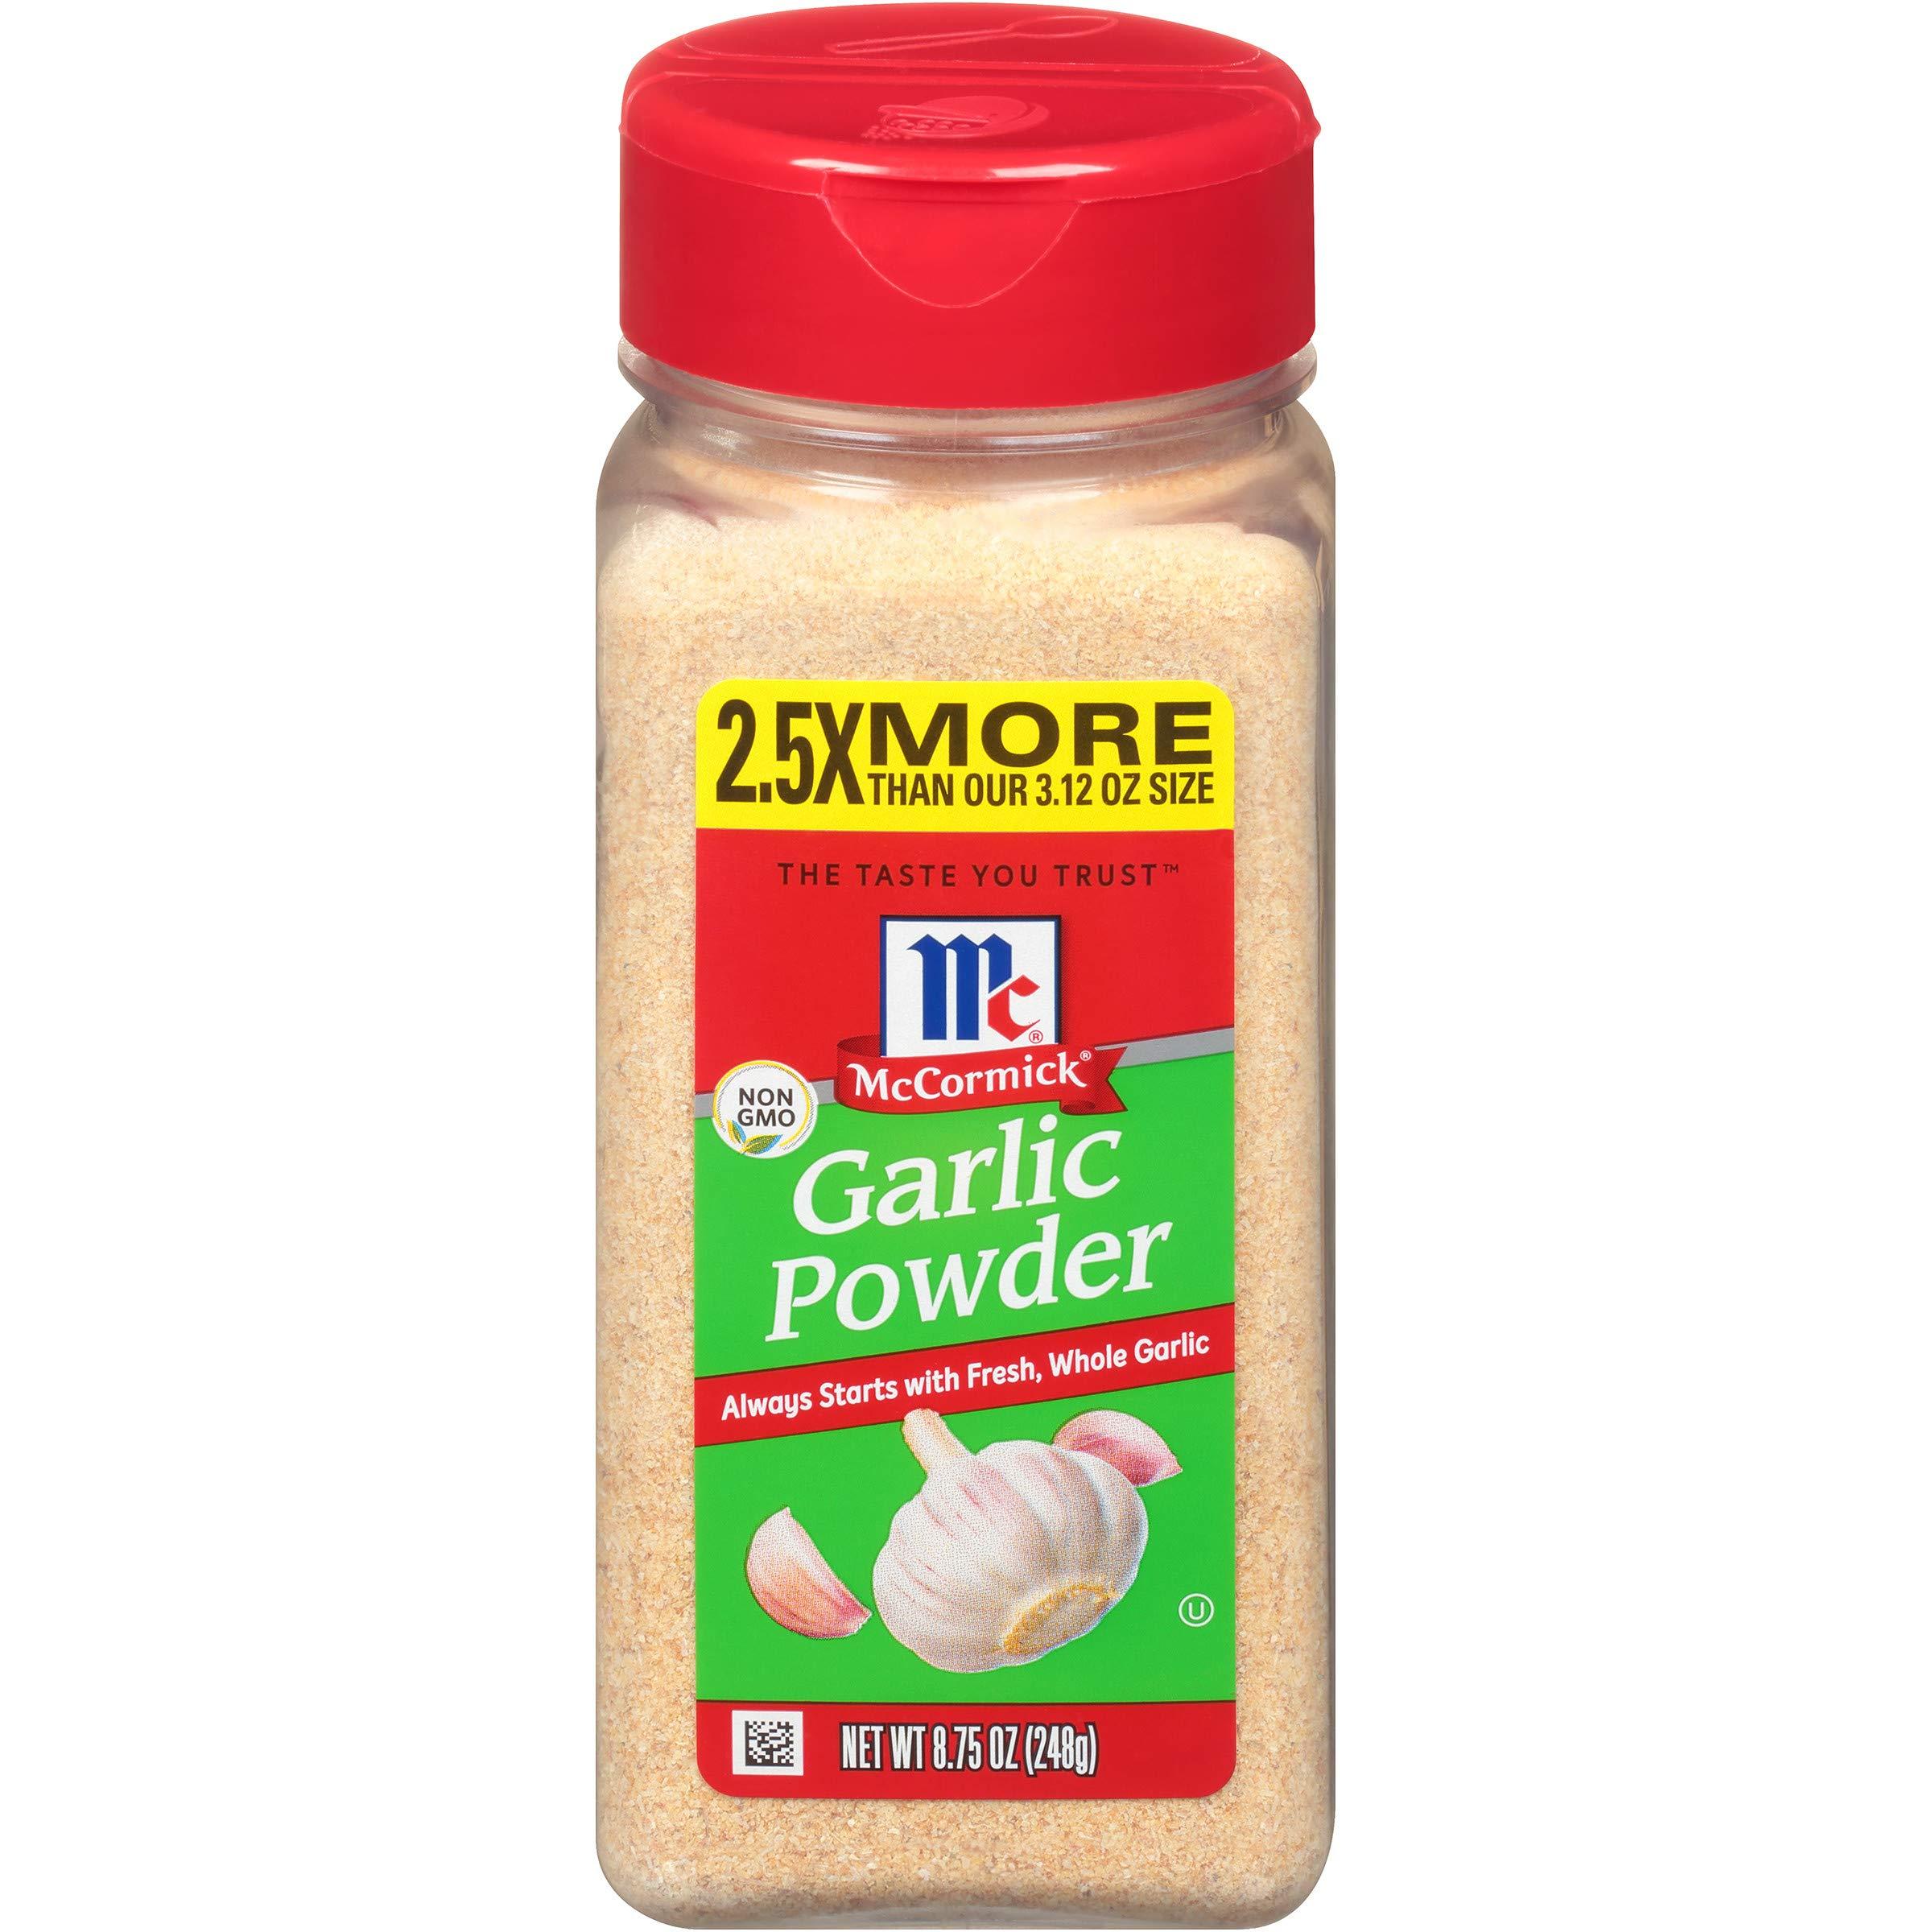 McCormick Classic Garlic Powder, Value Size, 8.75 Oz